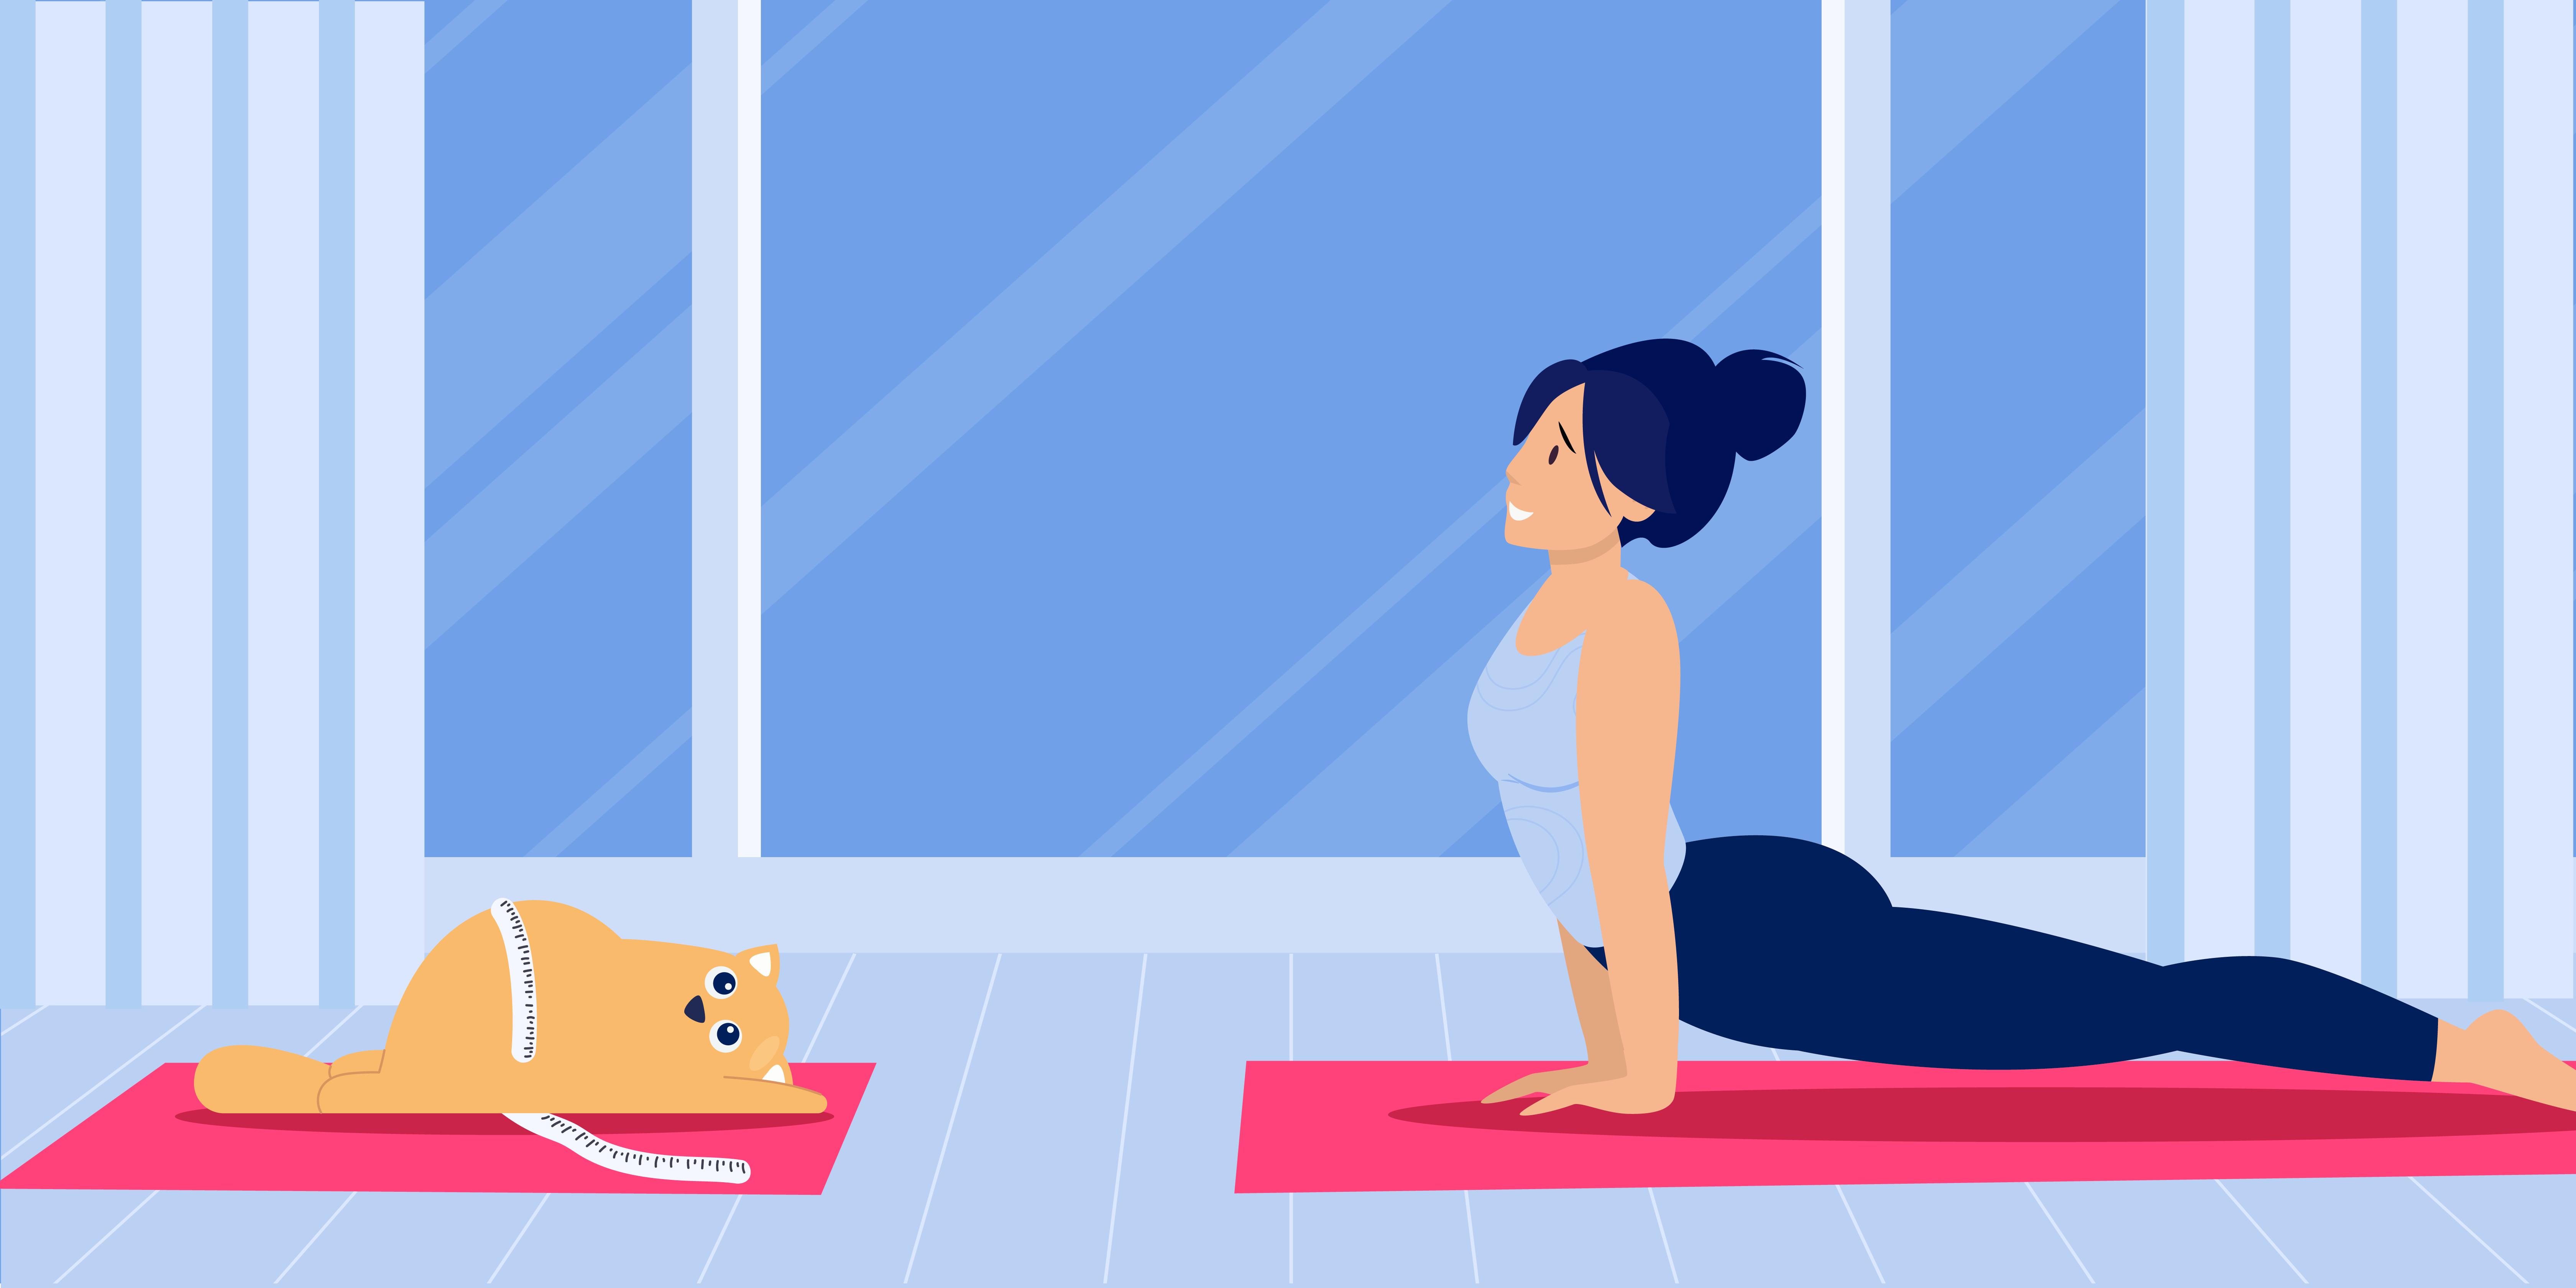 How Do I Know if my Dog or Cat is at a Healthy Weight?